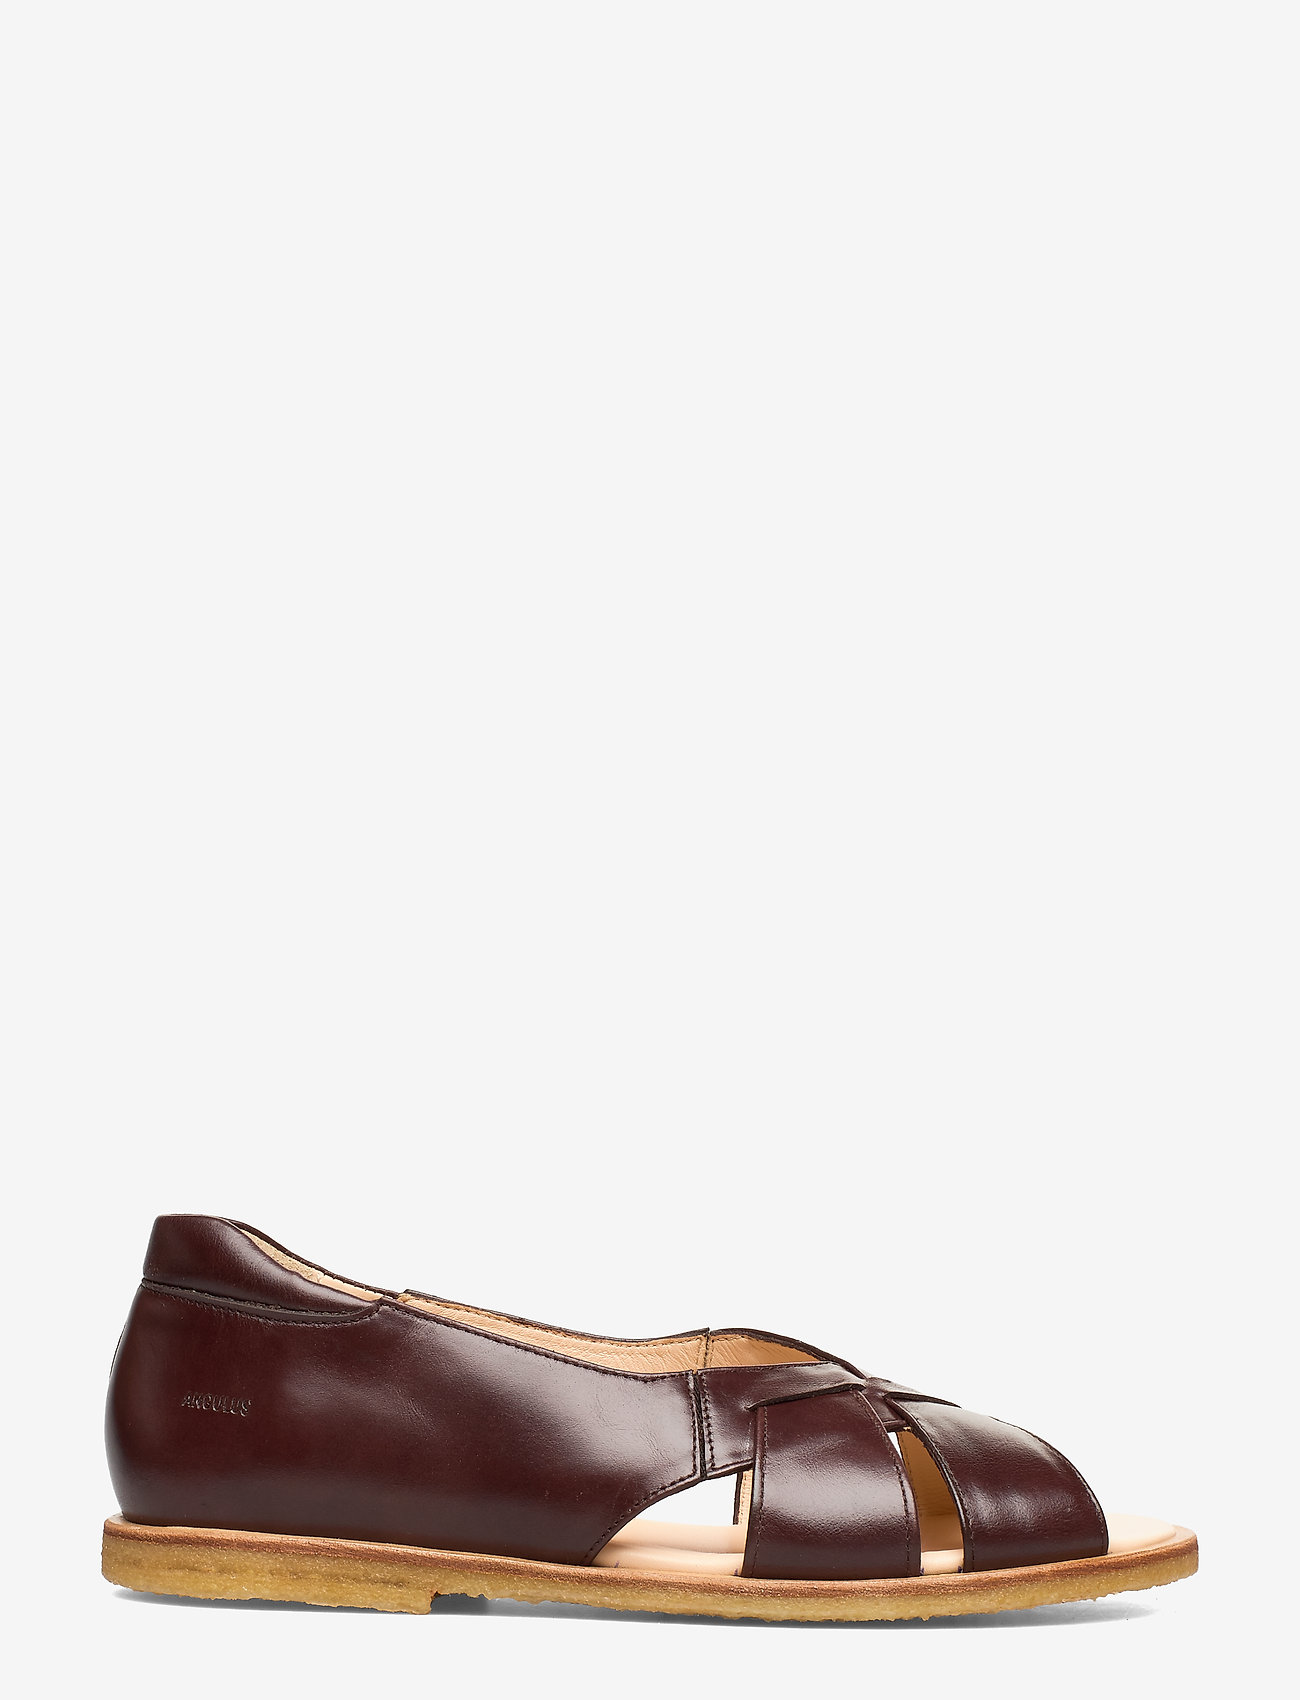 ANGULUS - Sandals - flat - open toe - op - platta sandaler - 1836/002 dark brown/dark brown - 1